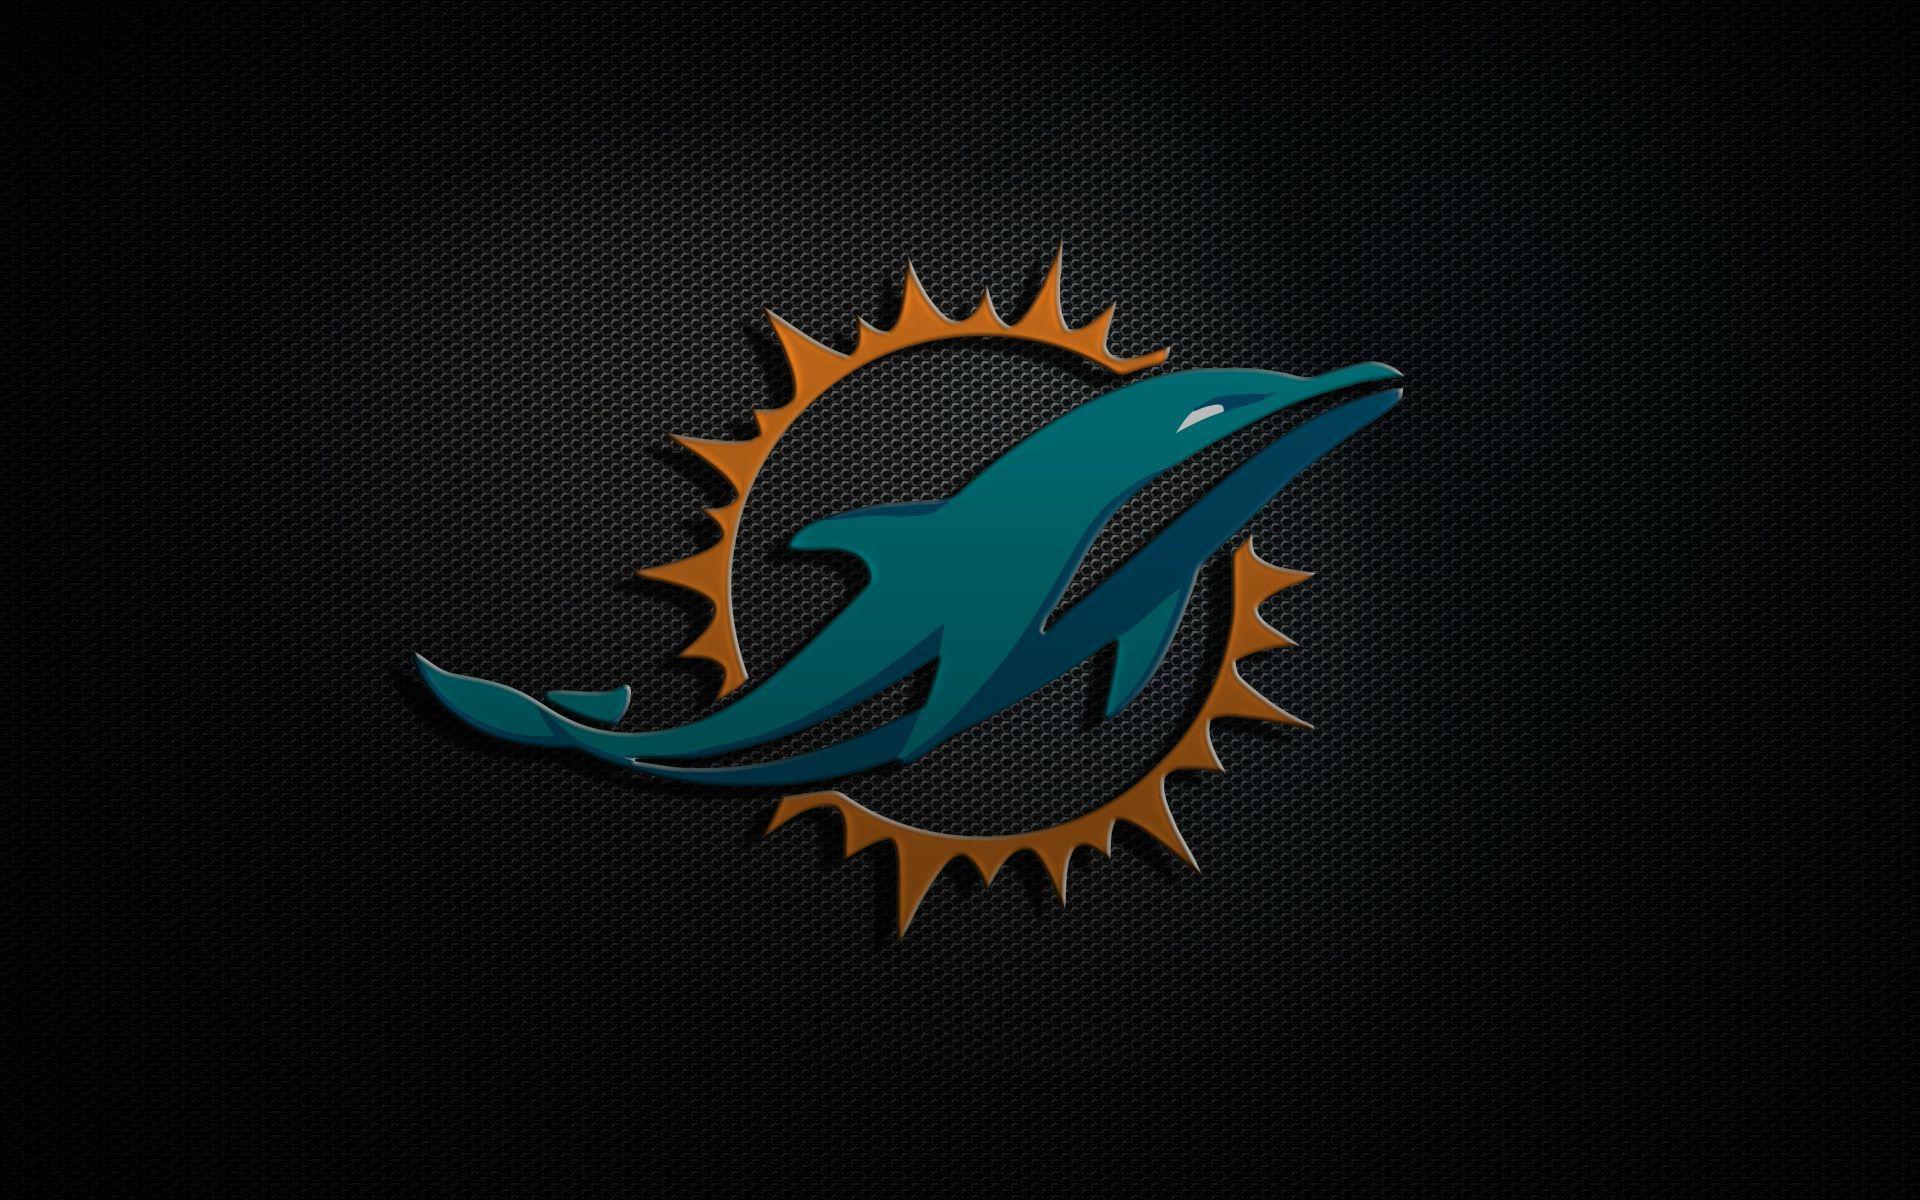 Miami Dolphins Wallpapers Miami Dolphins Wallpaper Miami Dolphins Dolphins